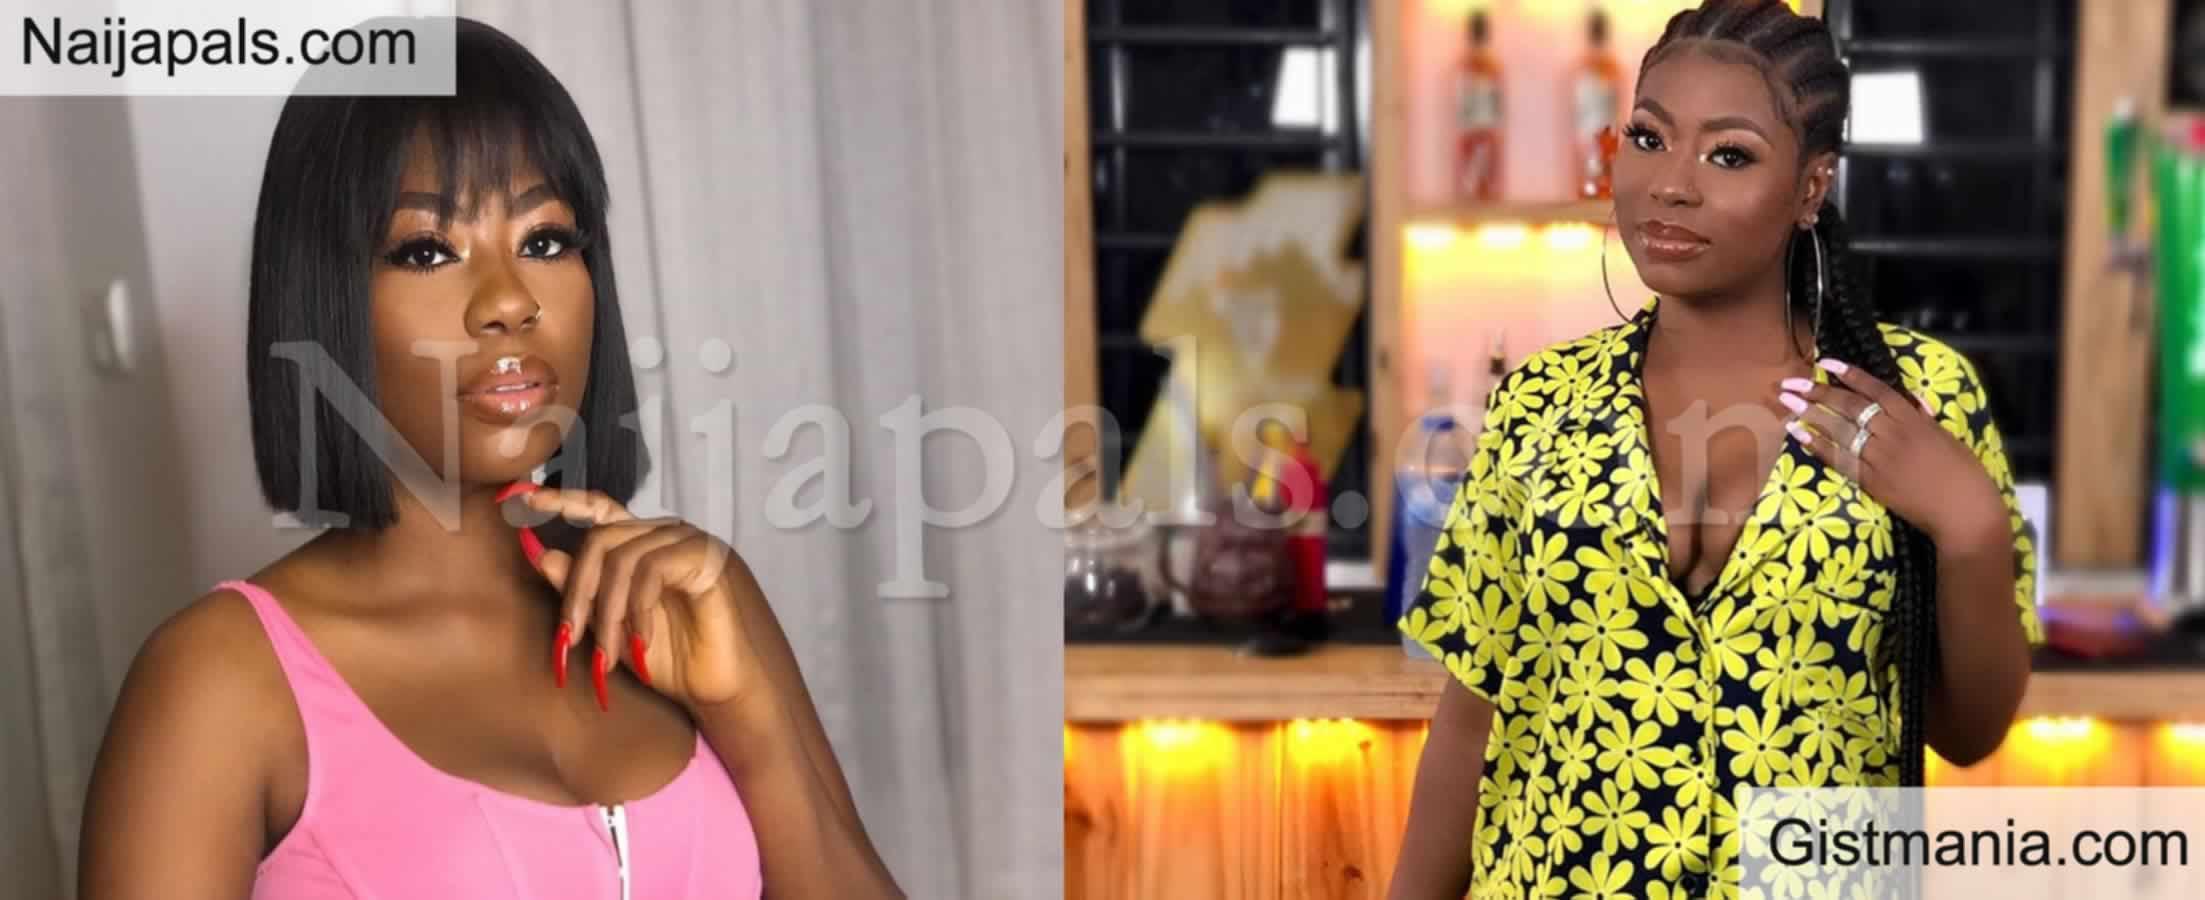 I'm Your Ancestor, President & Boss - Davido's Babymama, Sophia Momodu Replies Troll